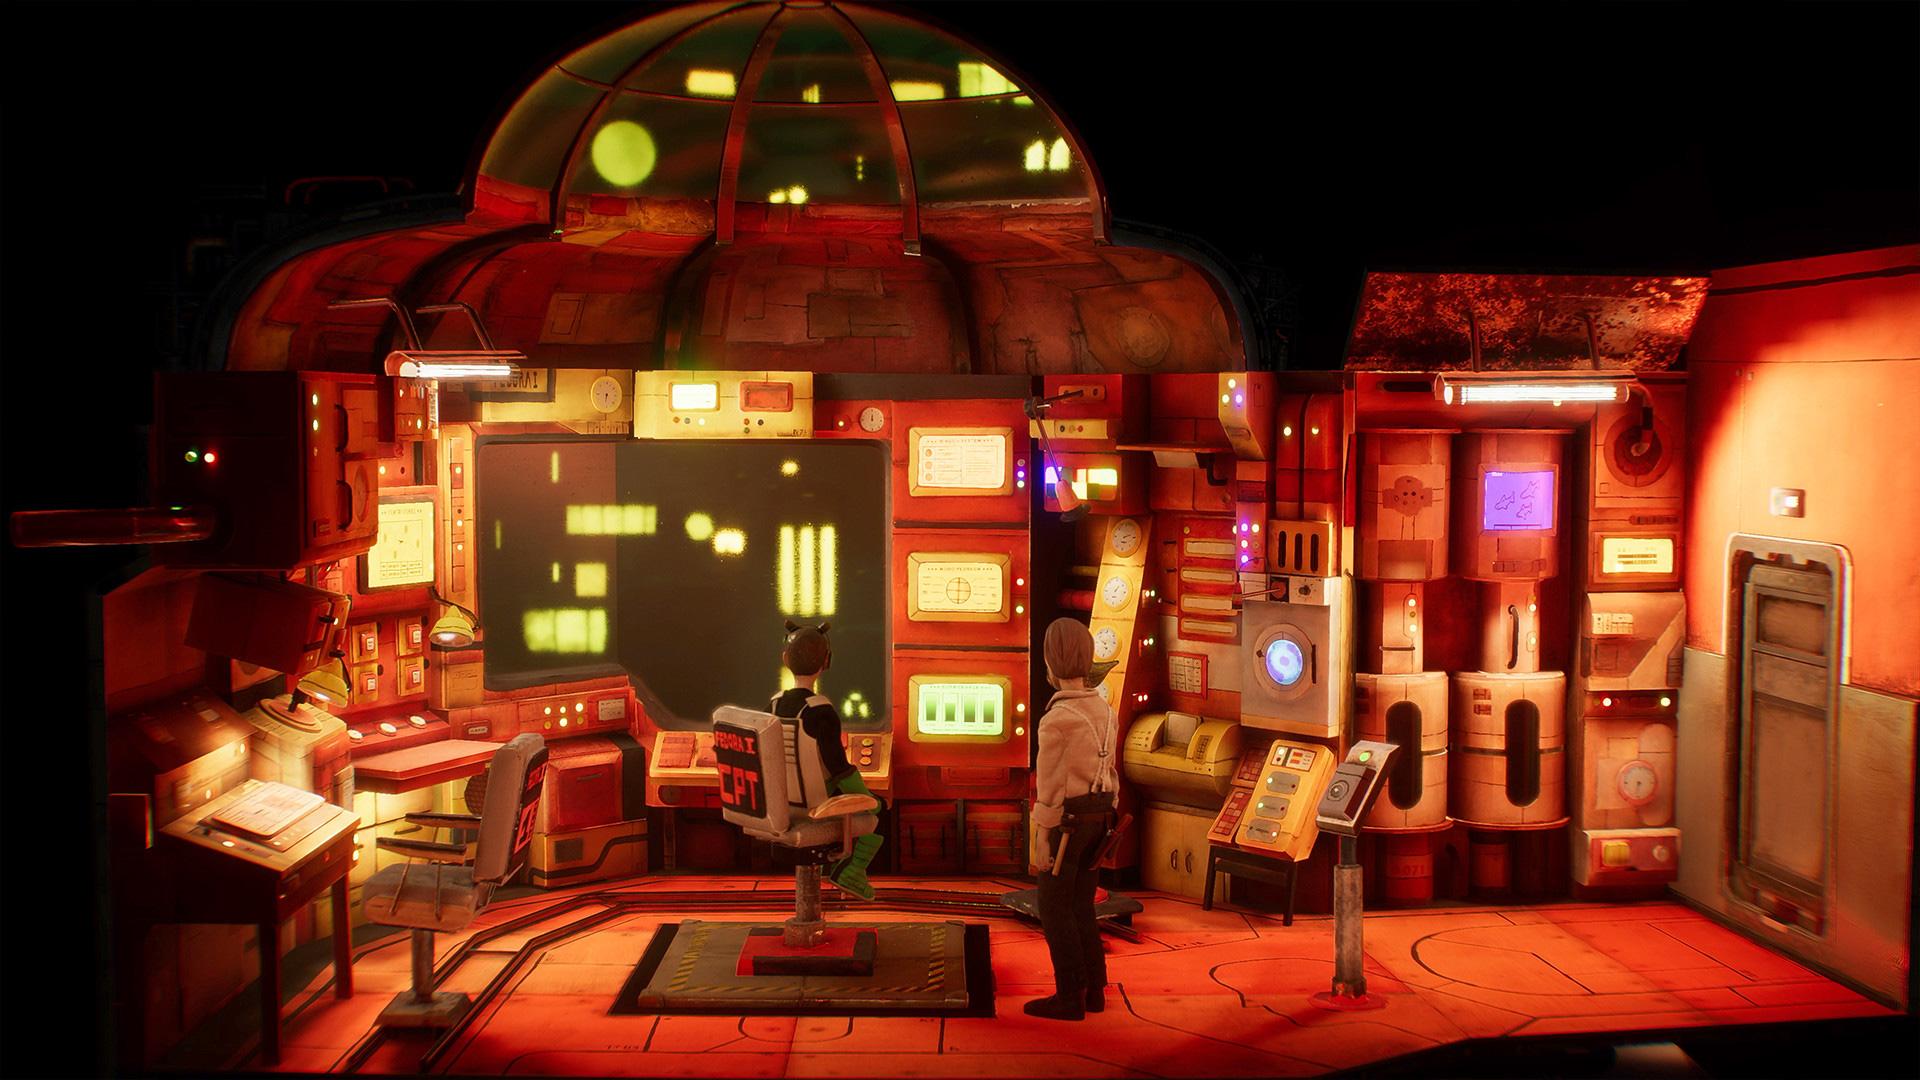 Harold Halibut, a hand-made adventure game set on a sunken ark, is coming 'soonish' screenshot